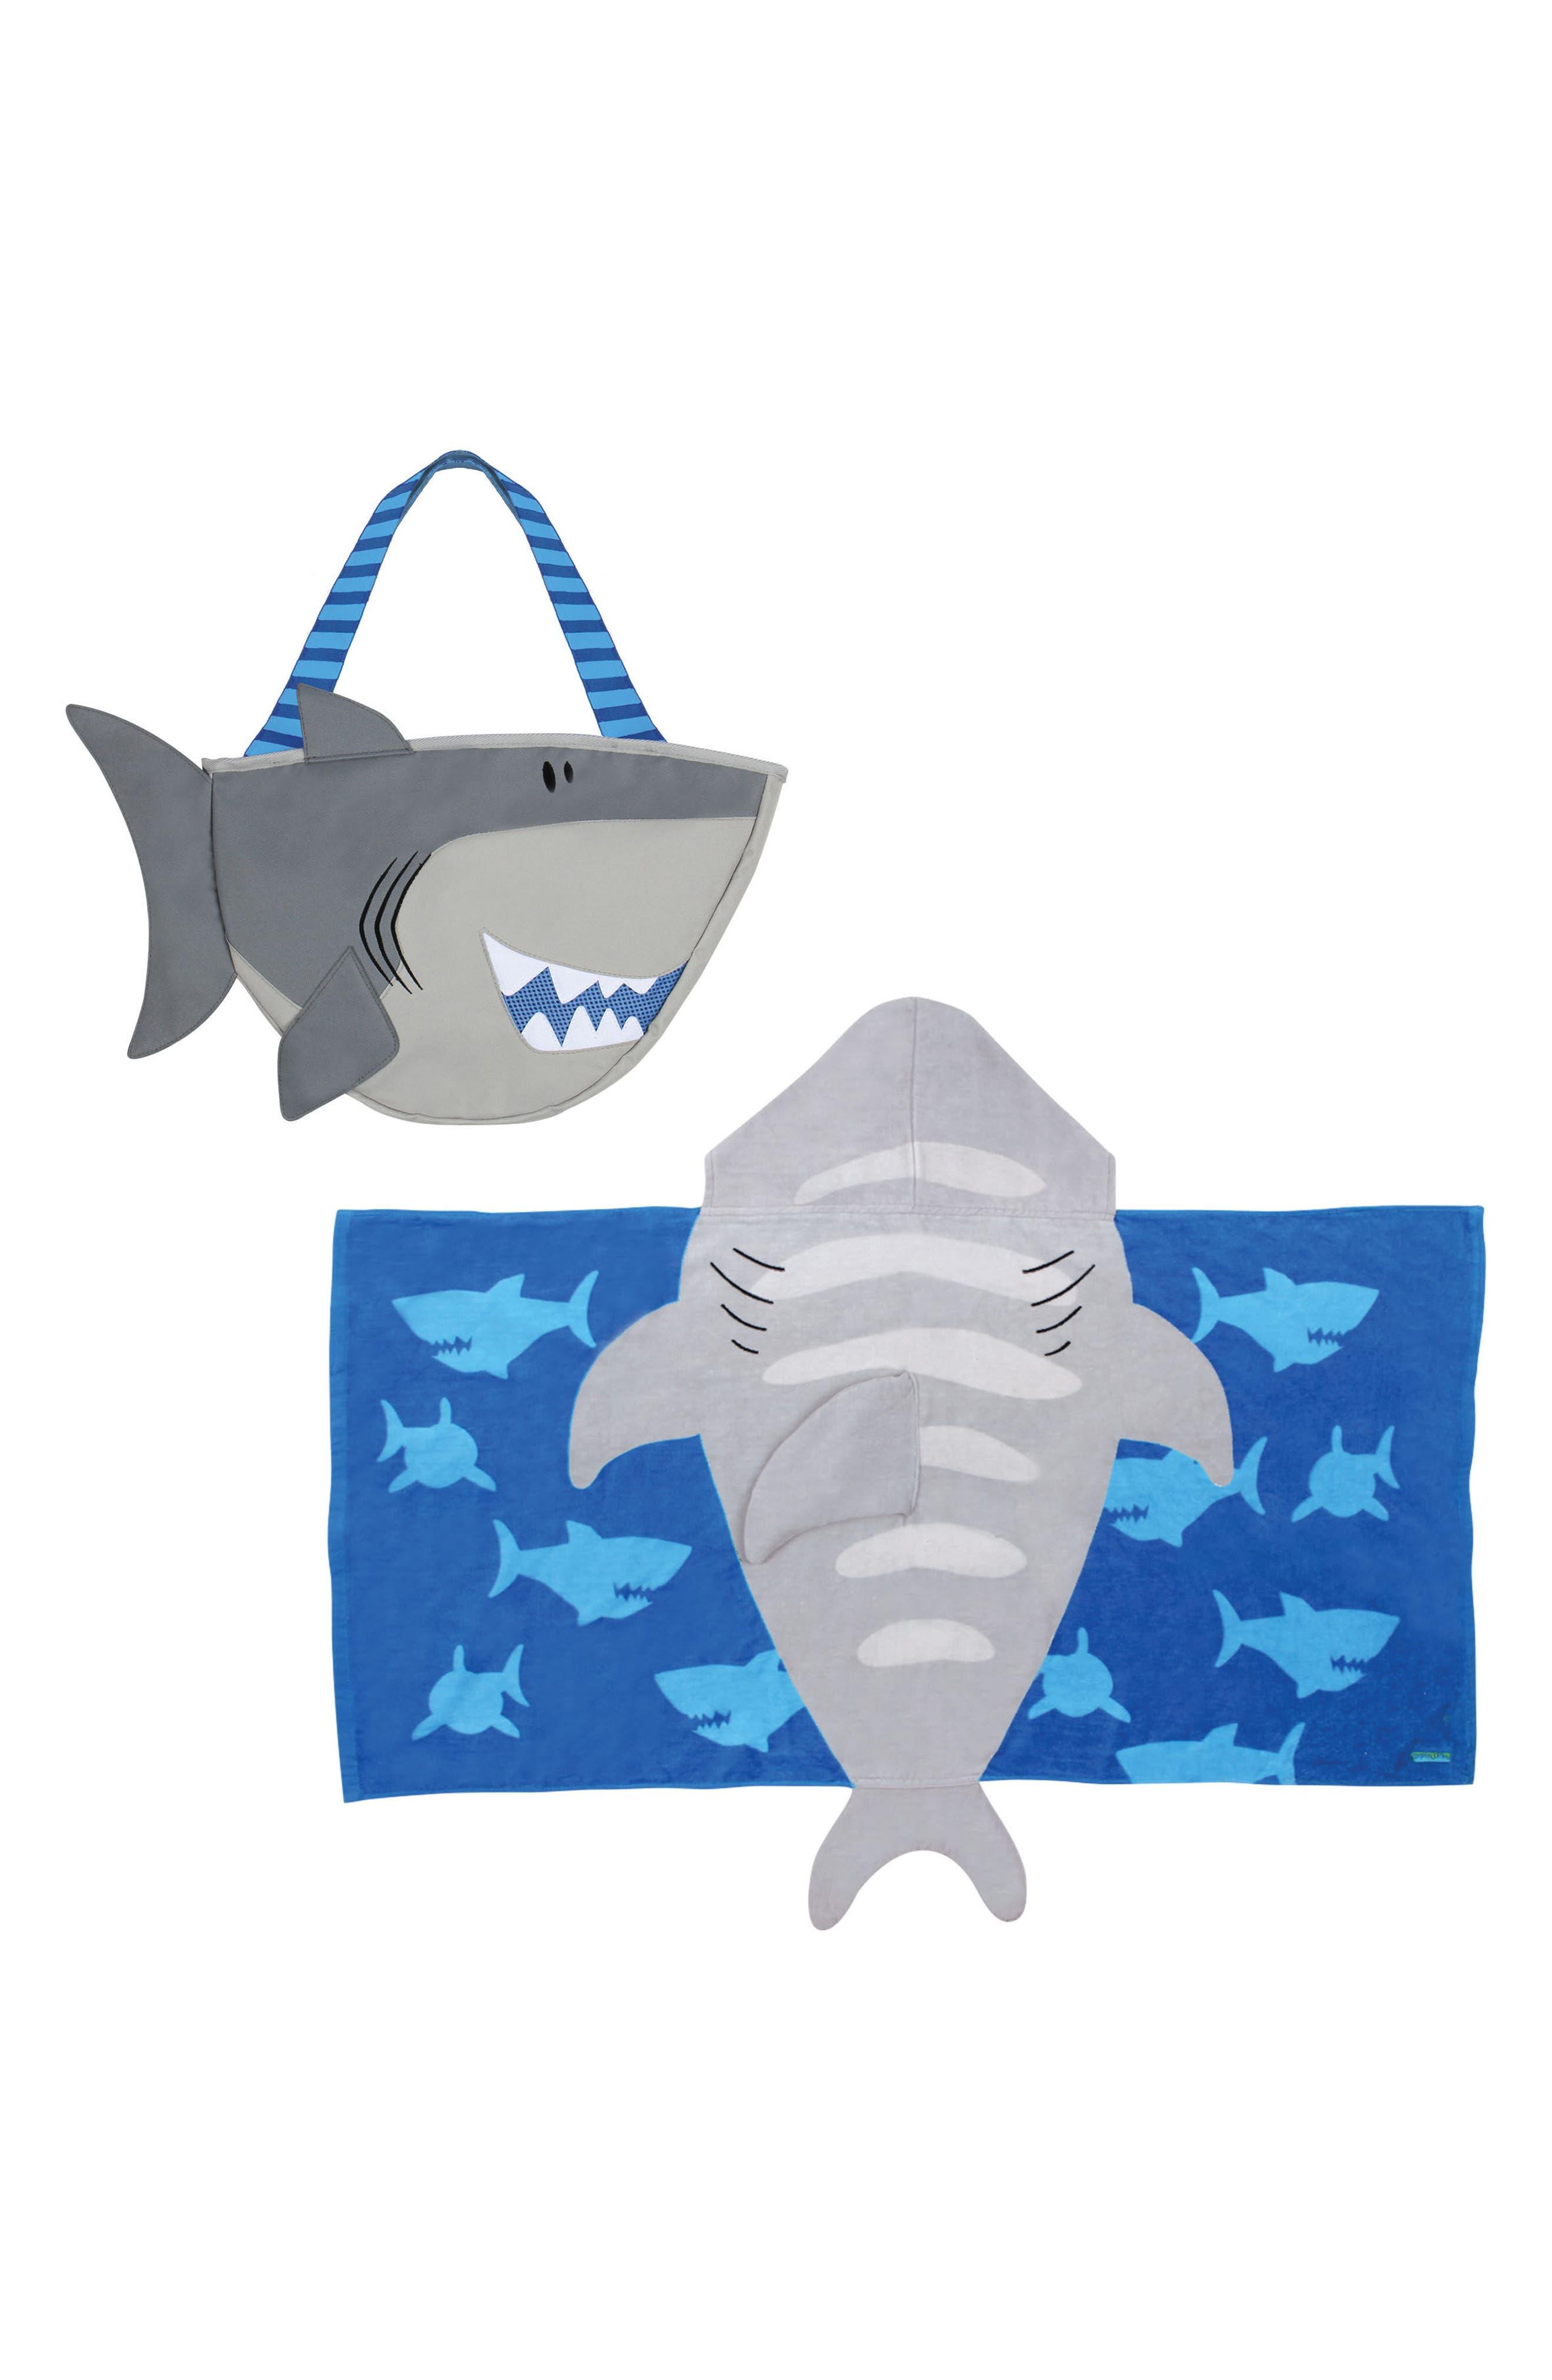 Beach Tote & Hooded Towel Set,                             Main thumbnail 1, color,                             GRAY SHARK